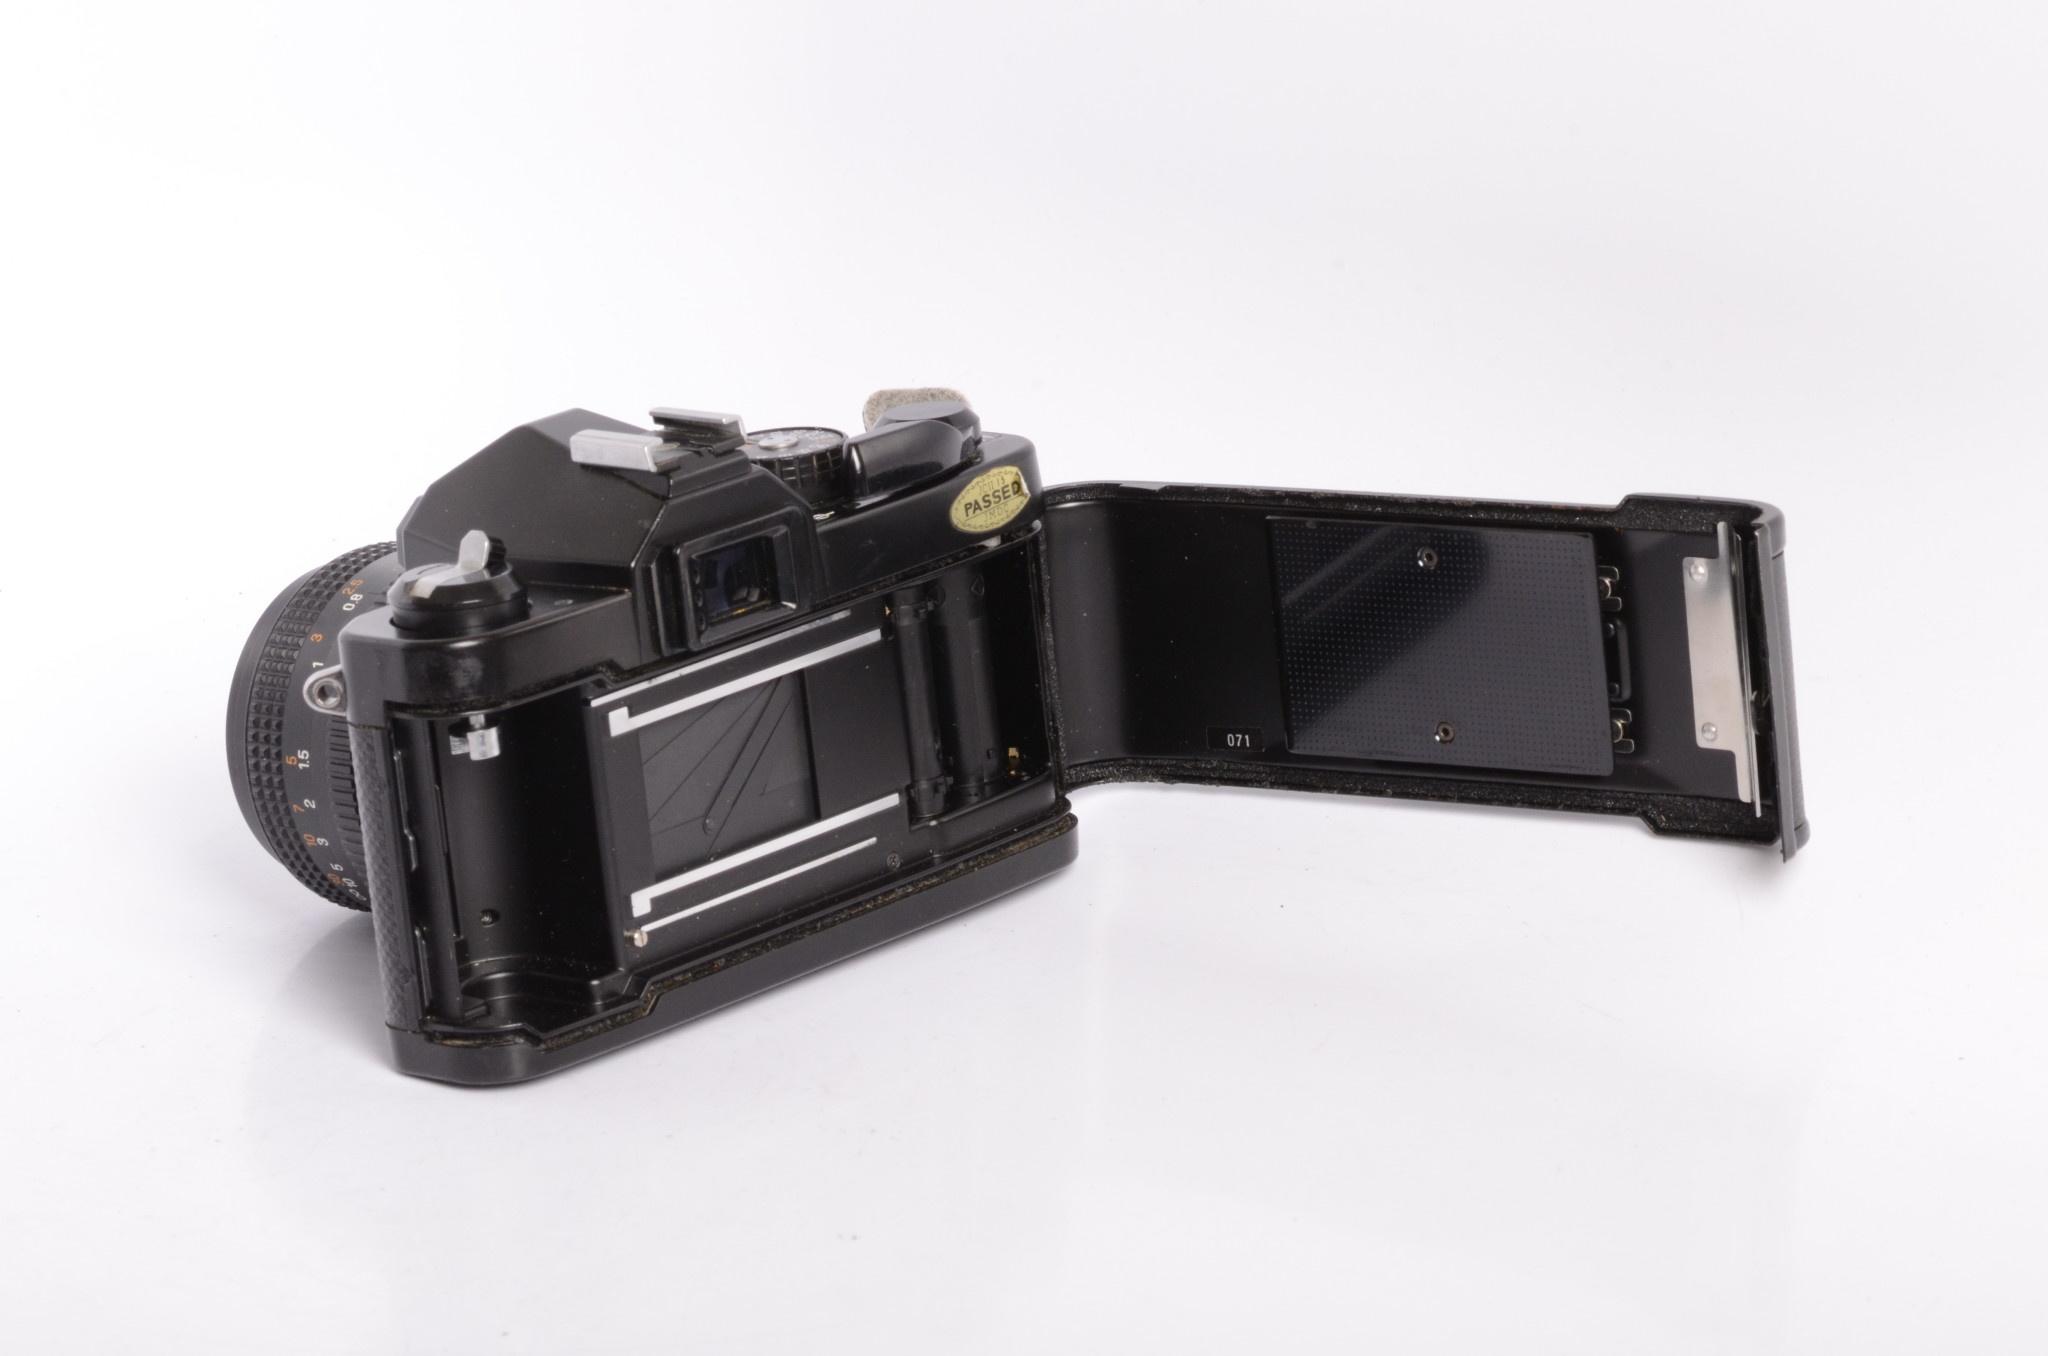 Chinon Chinon CM-4 35mm Manual SLR Camera w/50mm F/1.9 lens